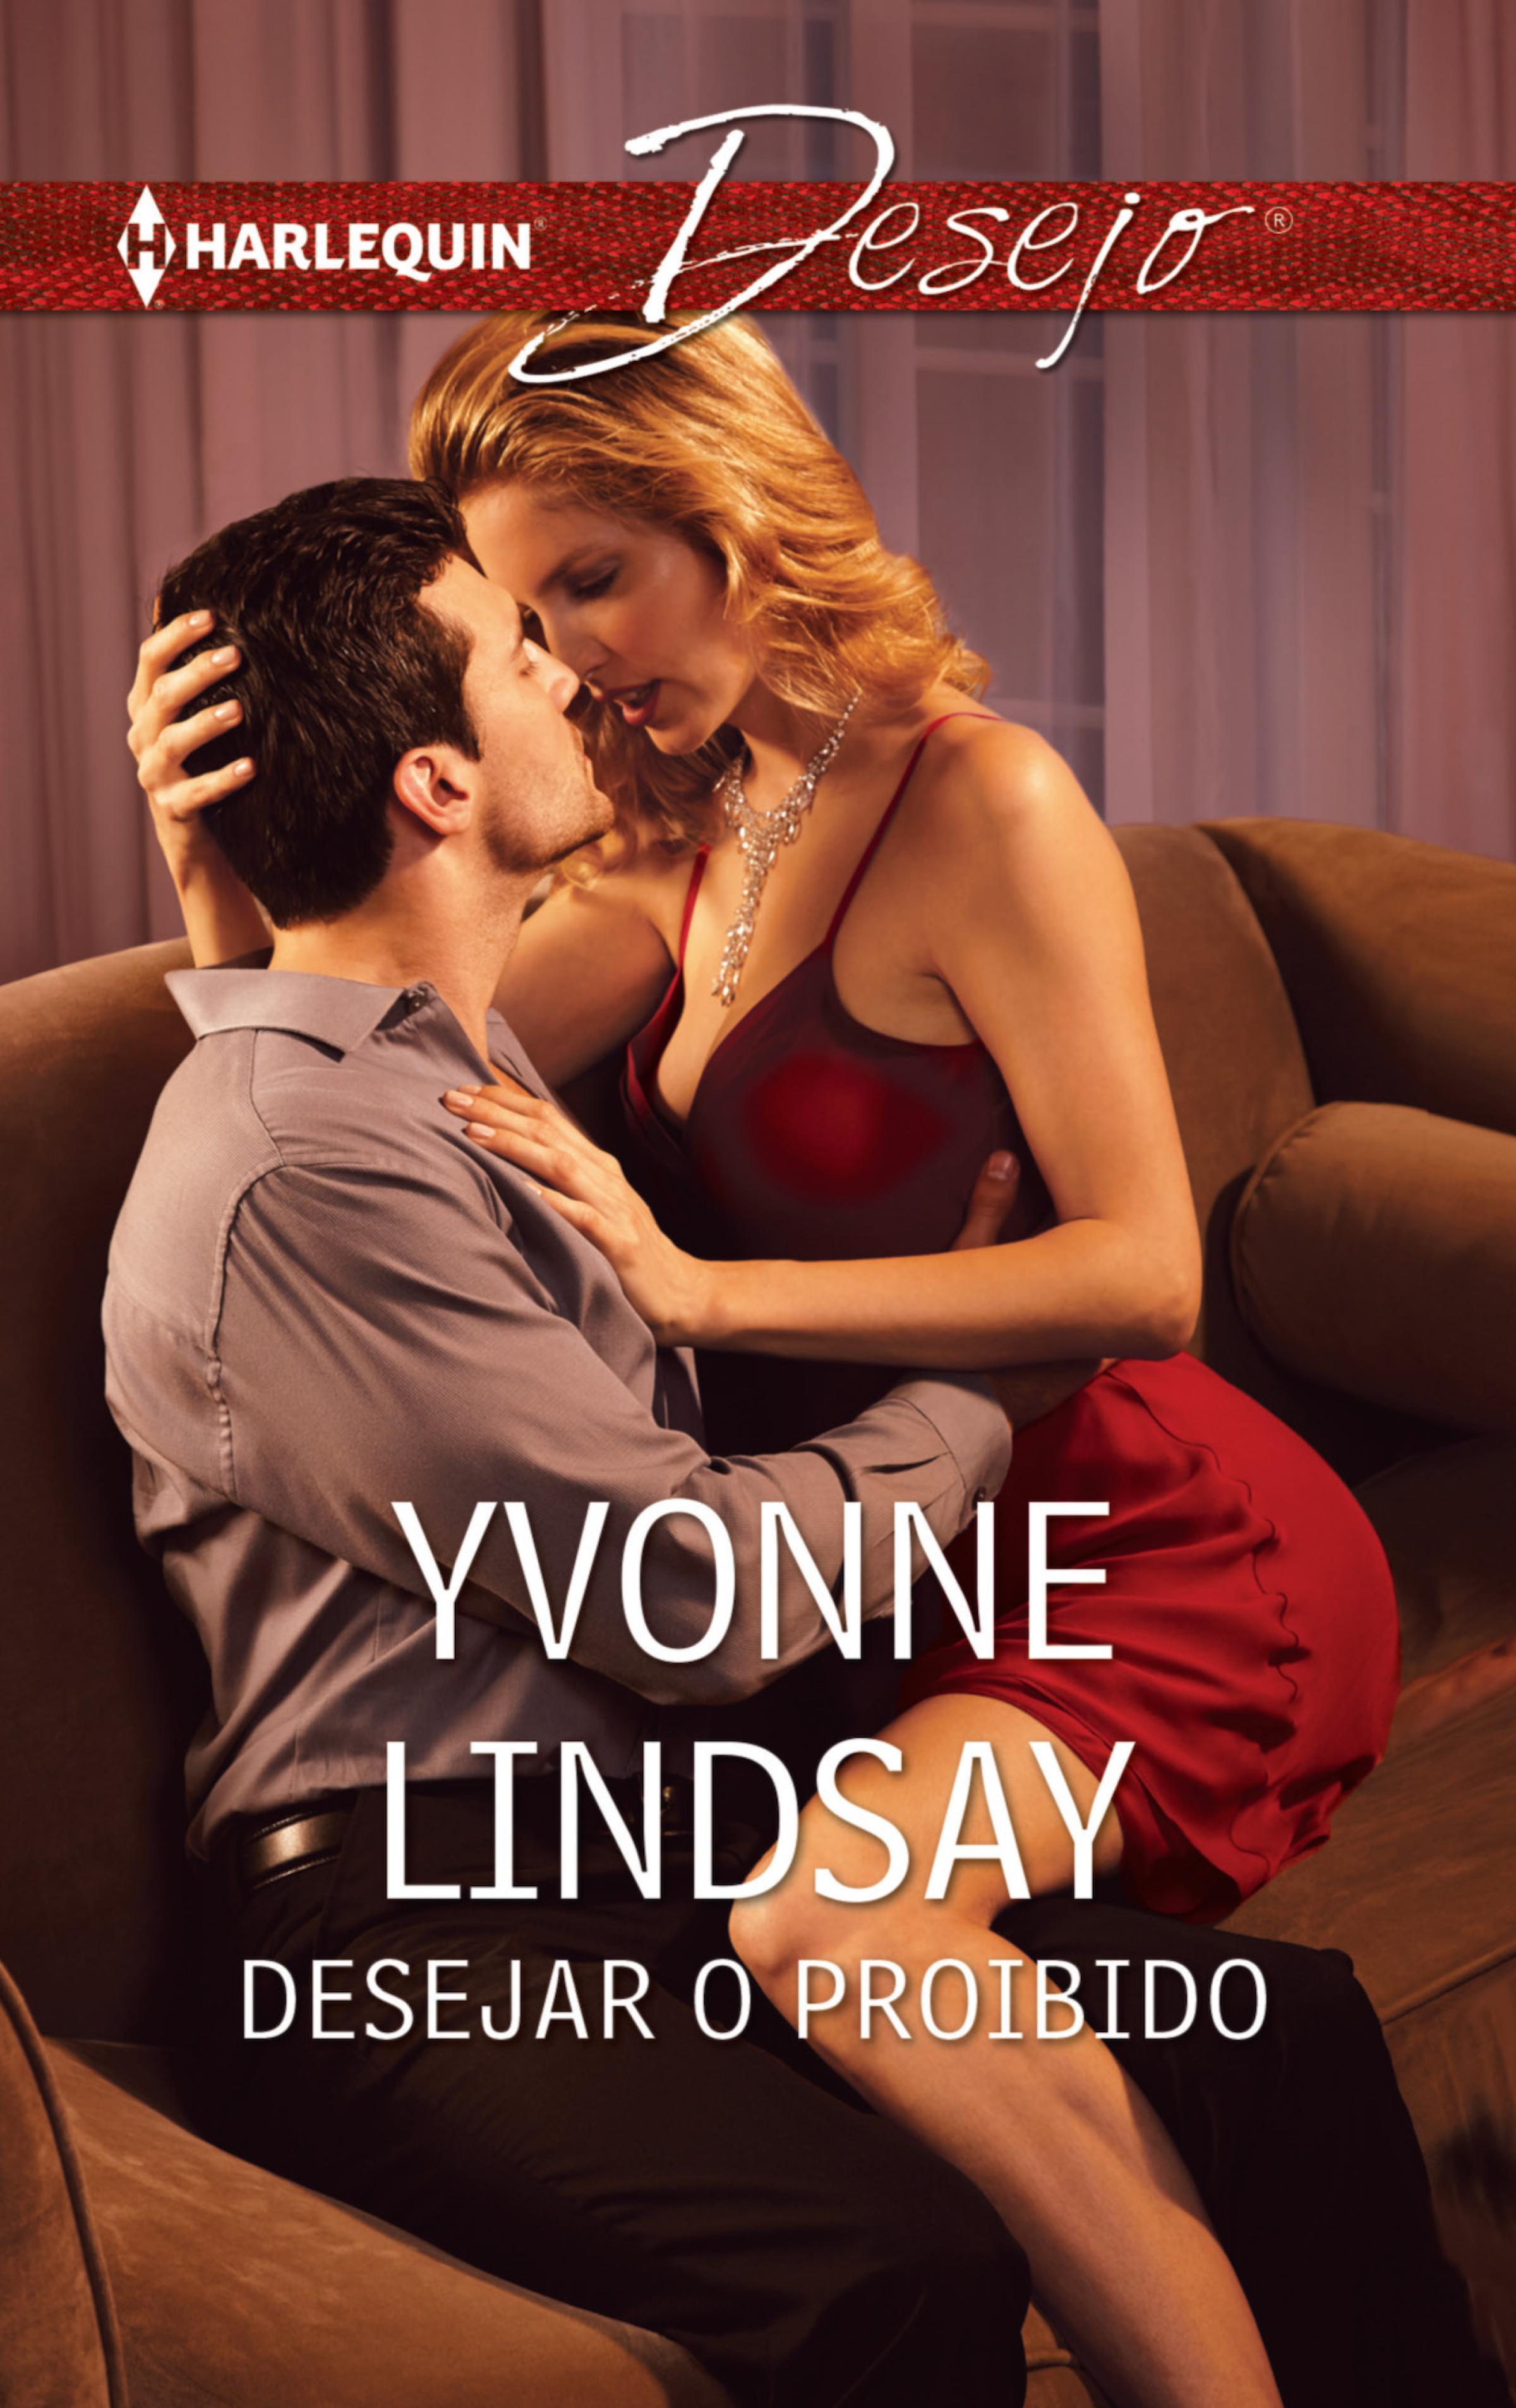 Yvonne Lindsay Desejar o proibido yvonne 22 24 26